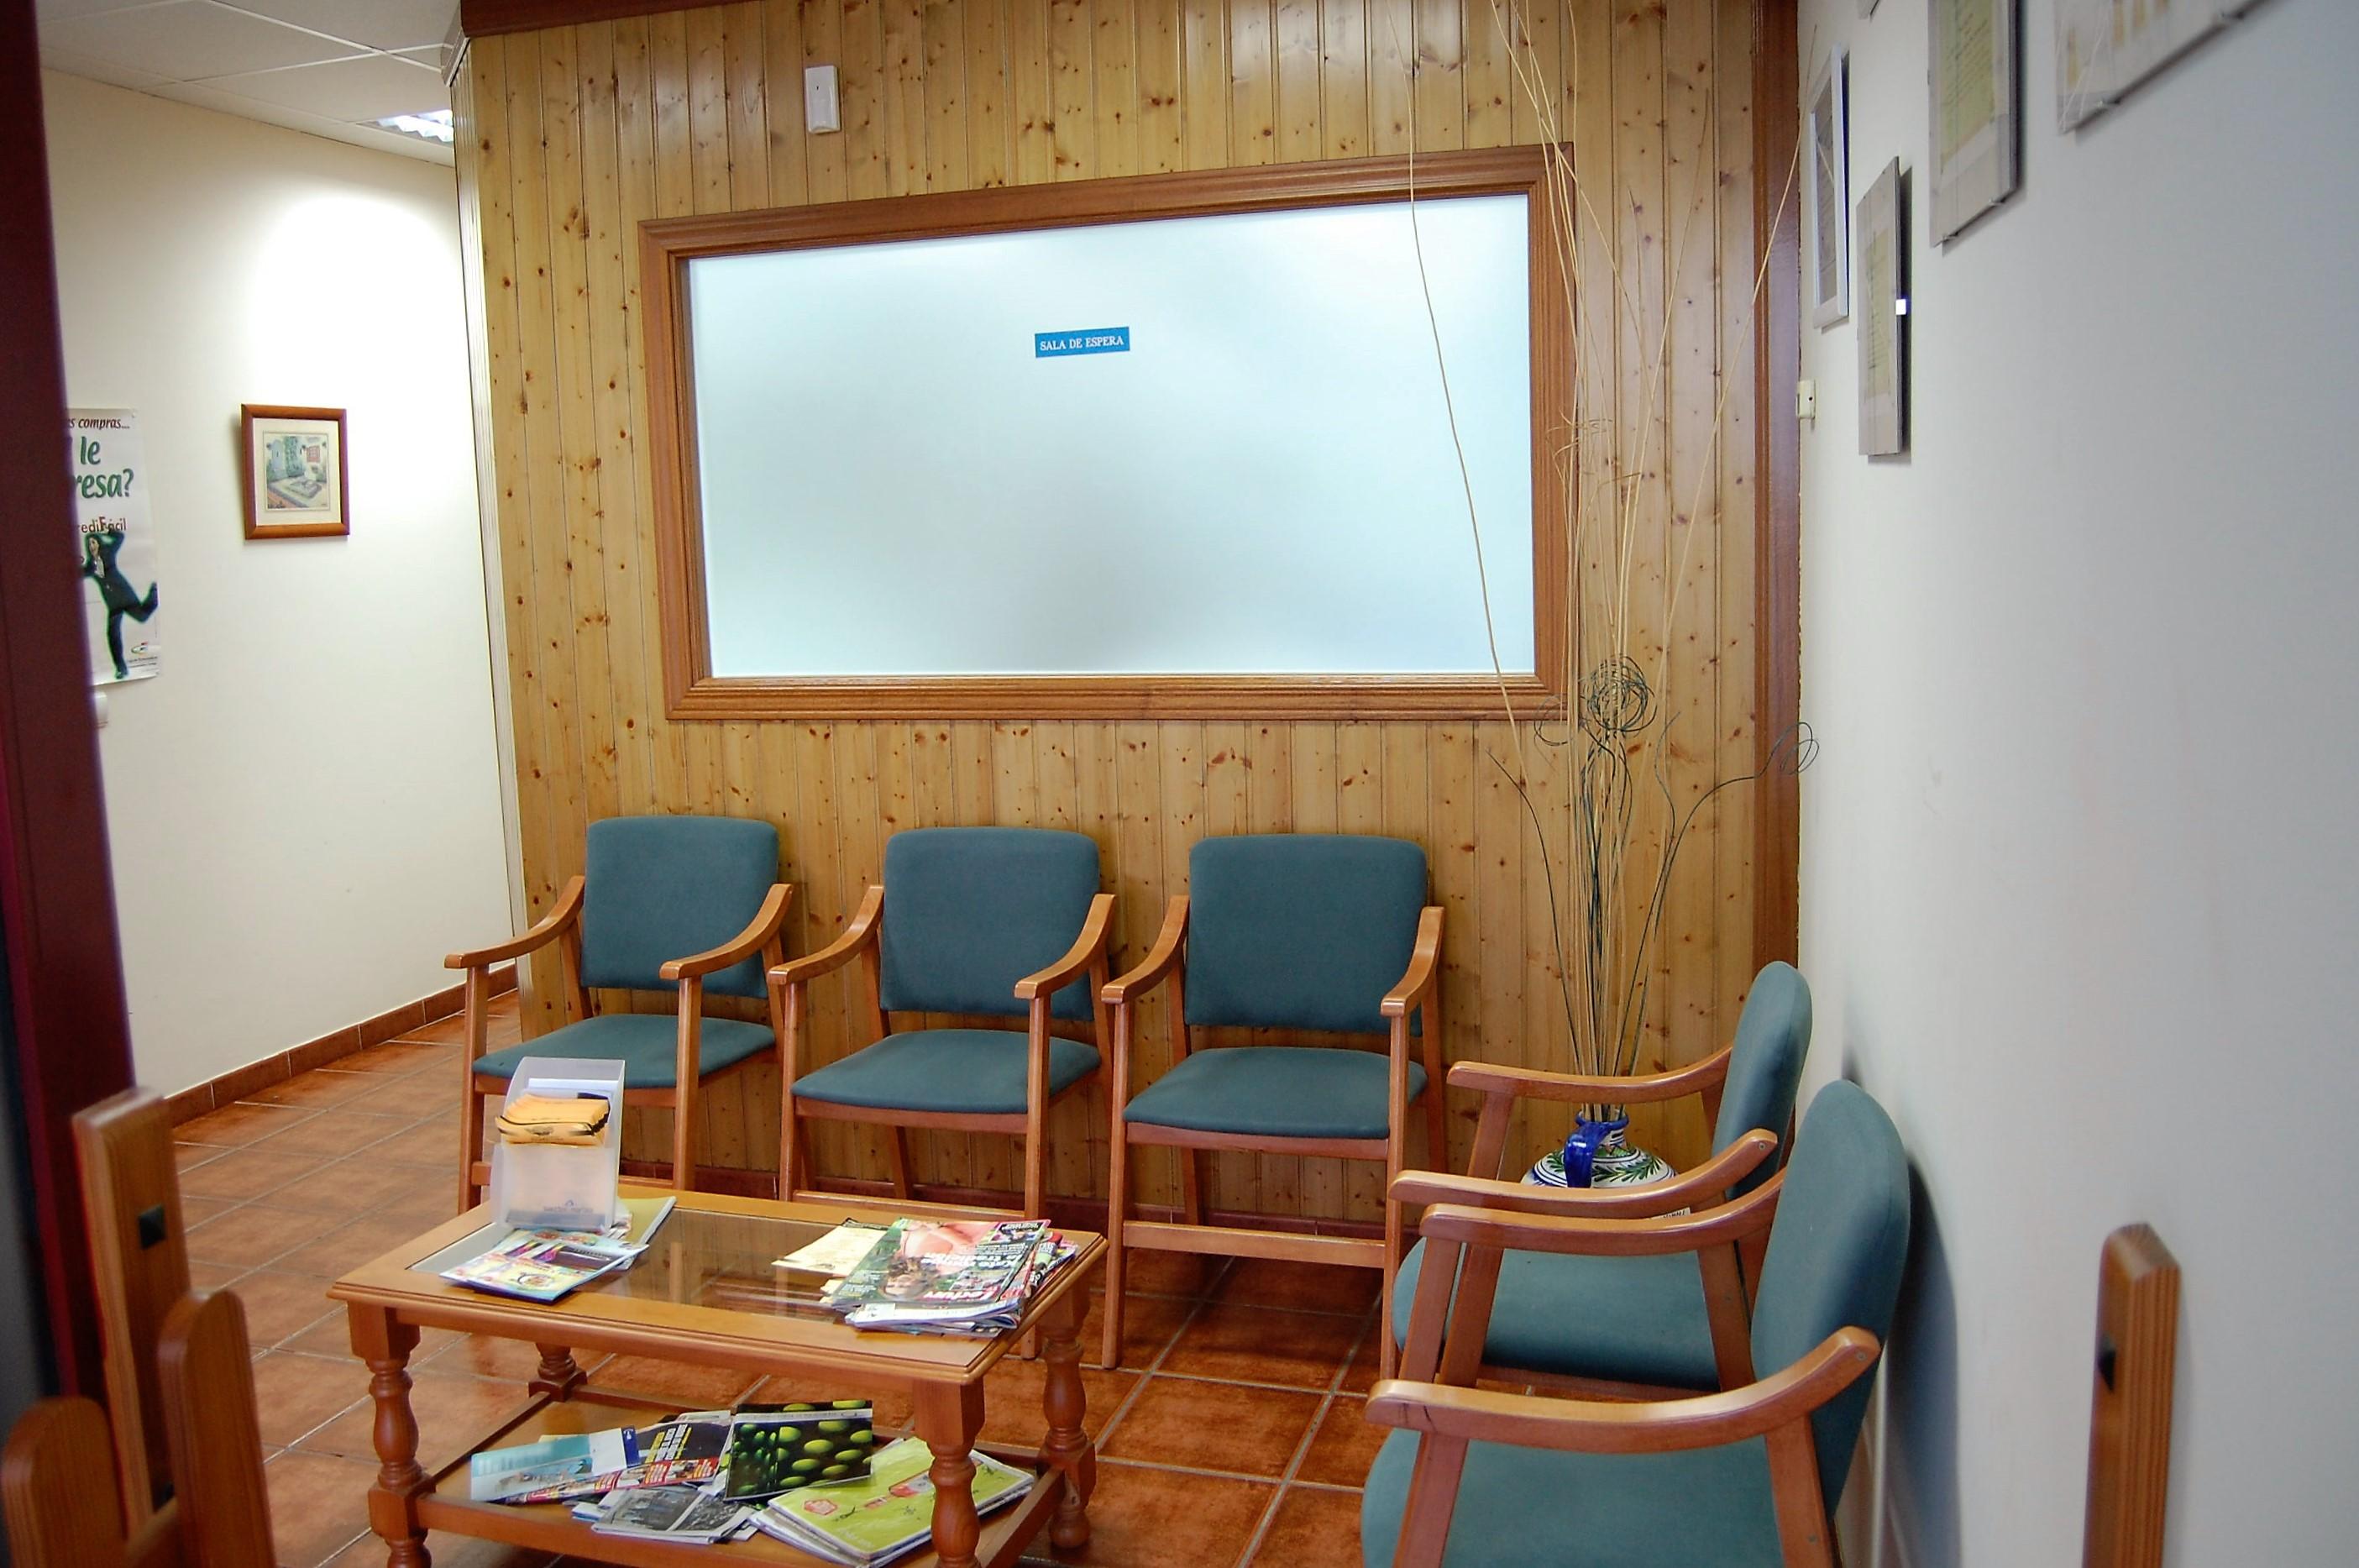 españa clínica dental en el casar de cáceres cebrián